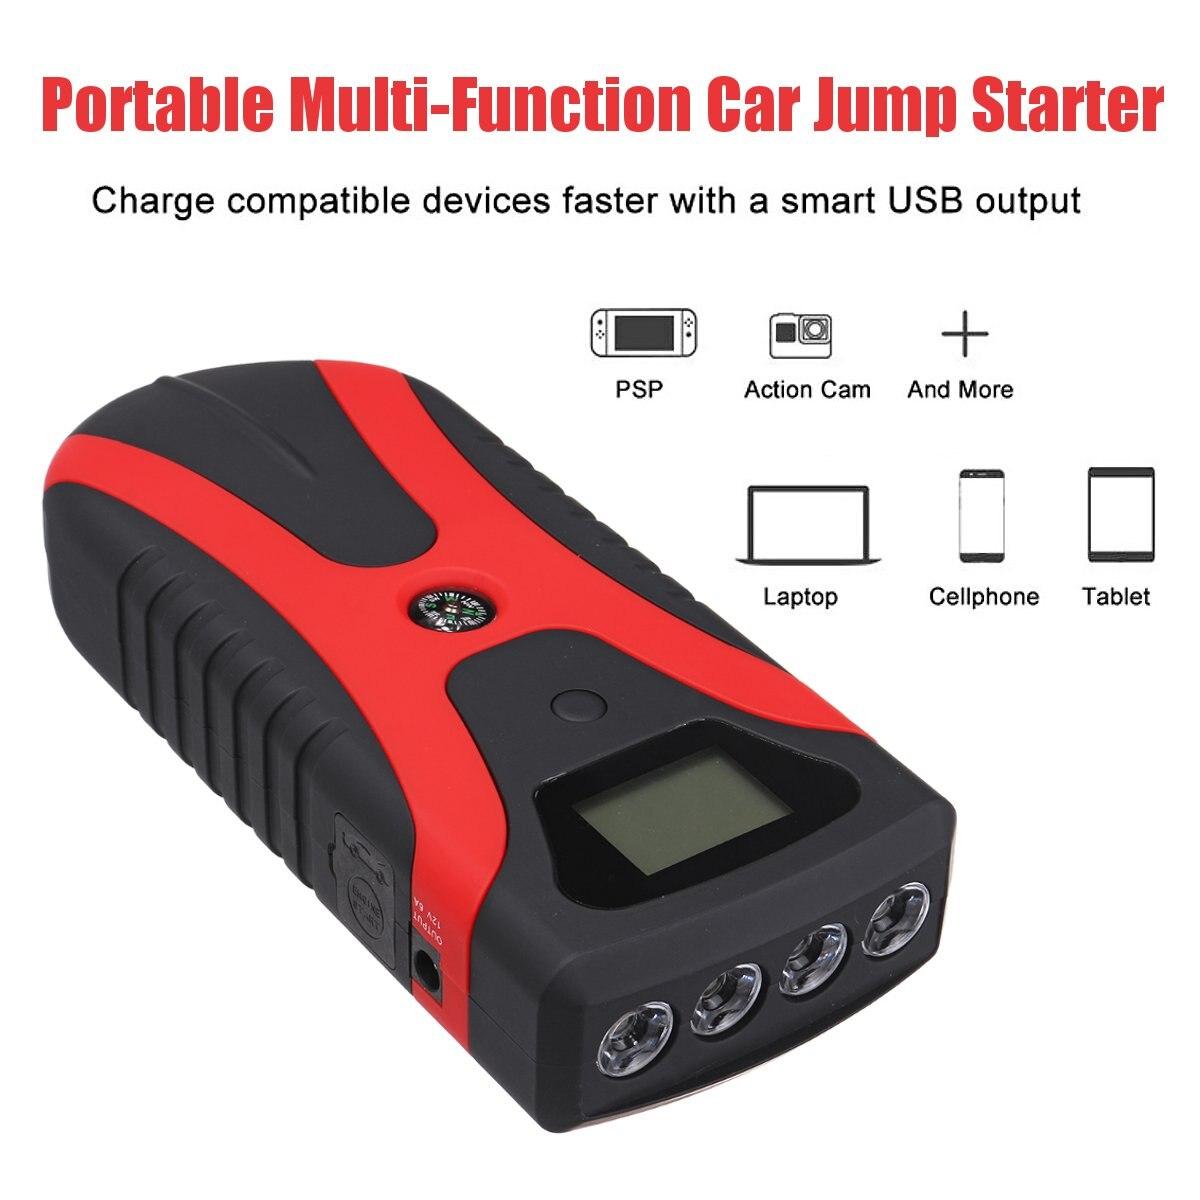 180A Tragbare Multi Funktion Power Auto Starthilfe Notfall Licht Tragbare Auto Batterie Booster Ladegerät Mit USB schnelle lade - 4